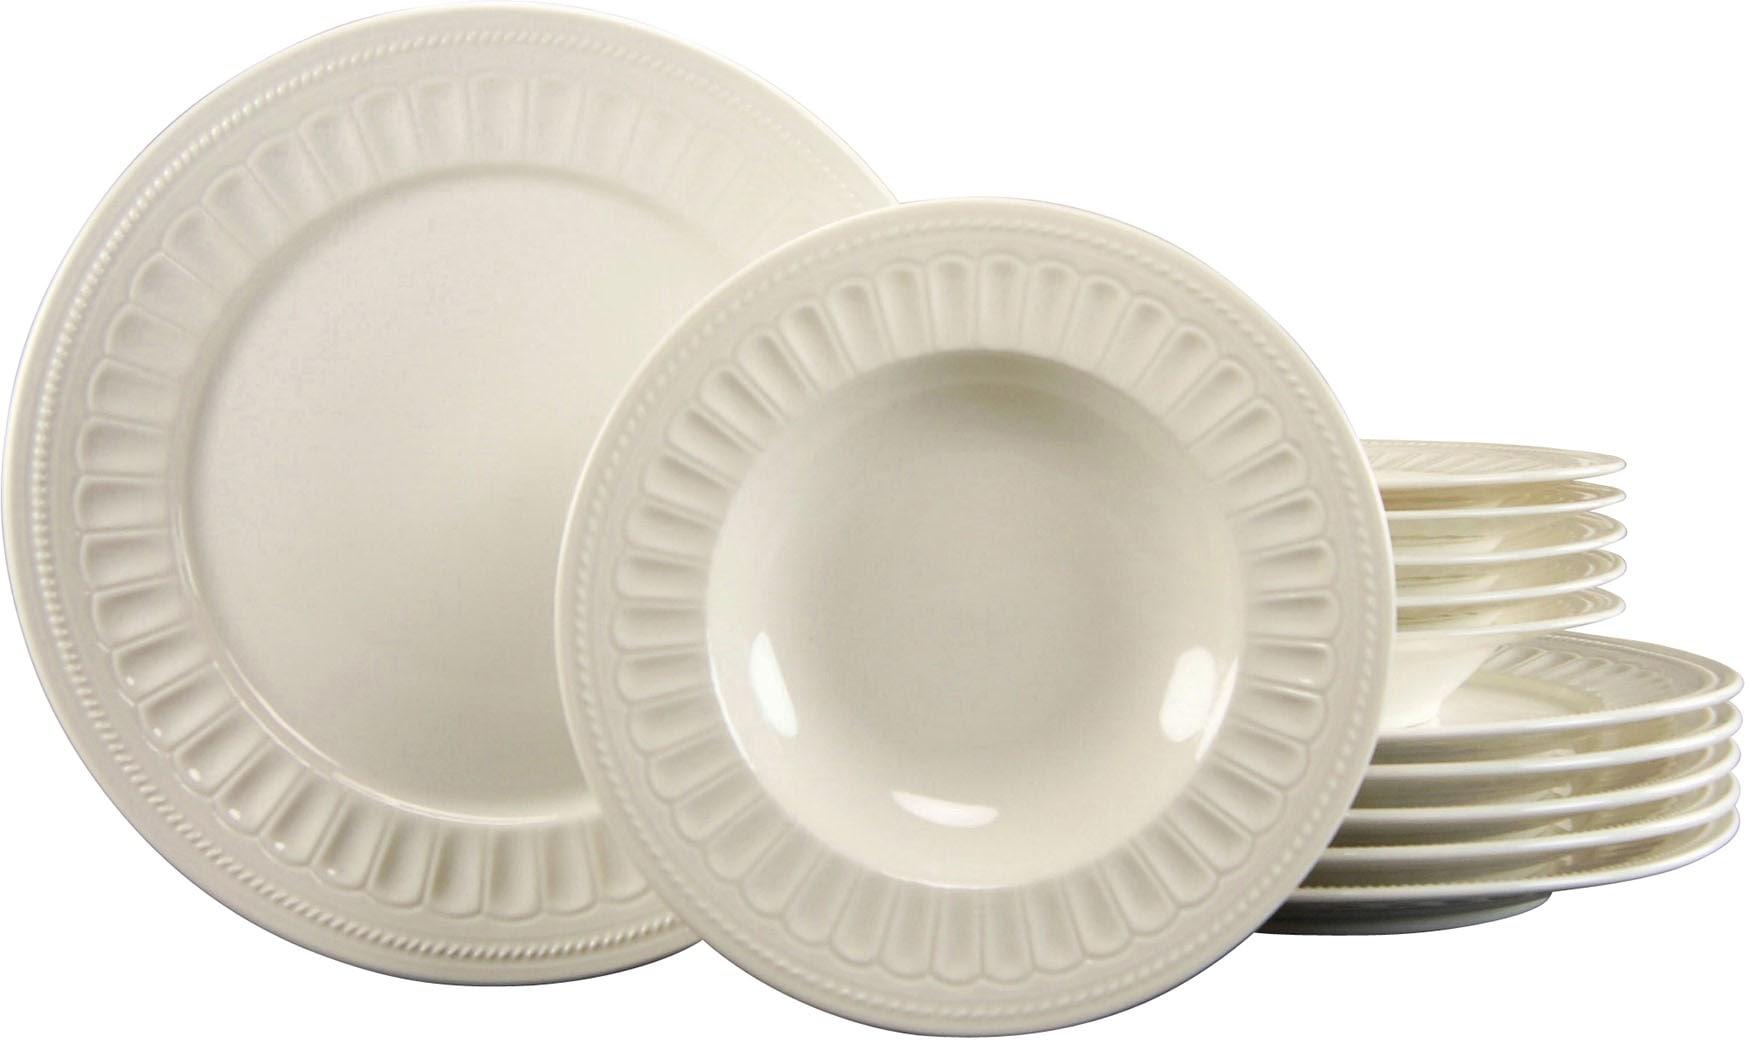 CreaTable Tafelservice Toledo, (Set, 12 tlg.), mit klassischem Relief weiß Geschirr-Sets Geschirr, Porzellan Tischaccessoires Haushaltswaren